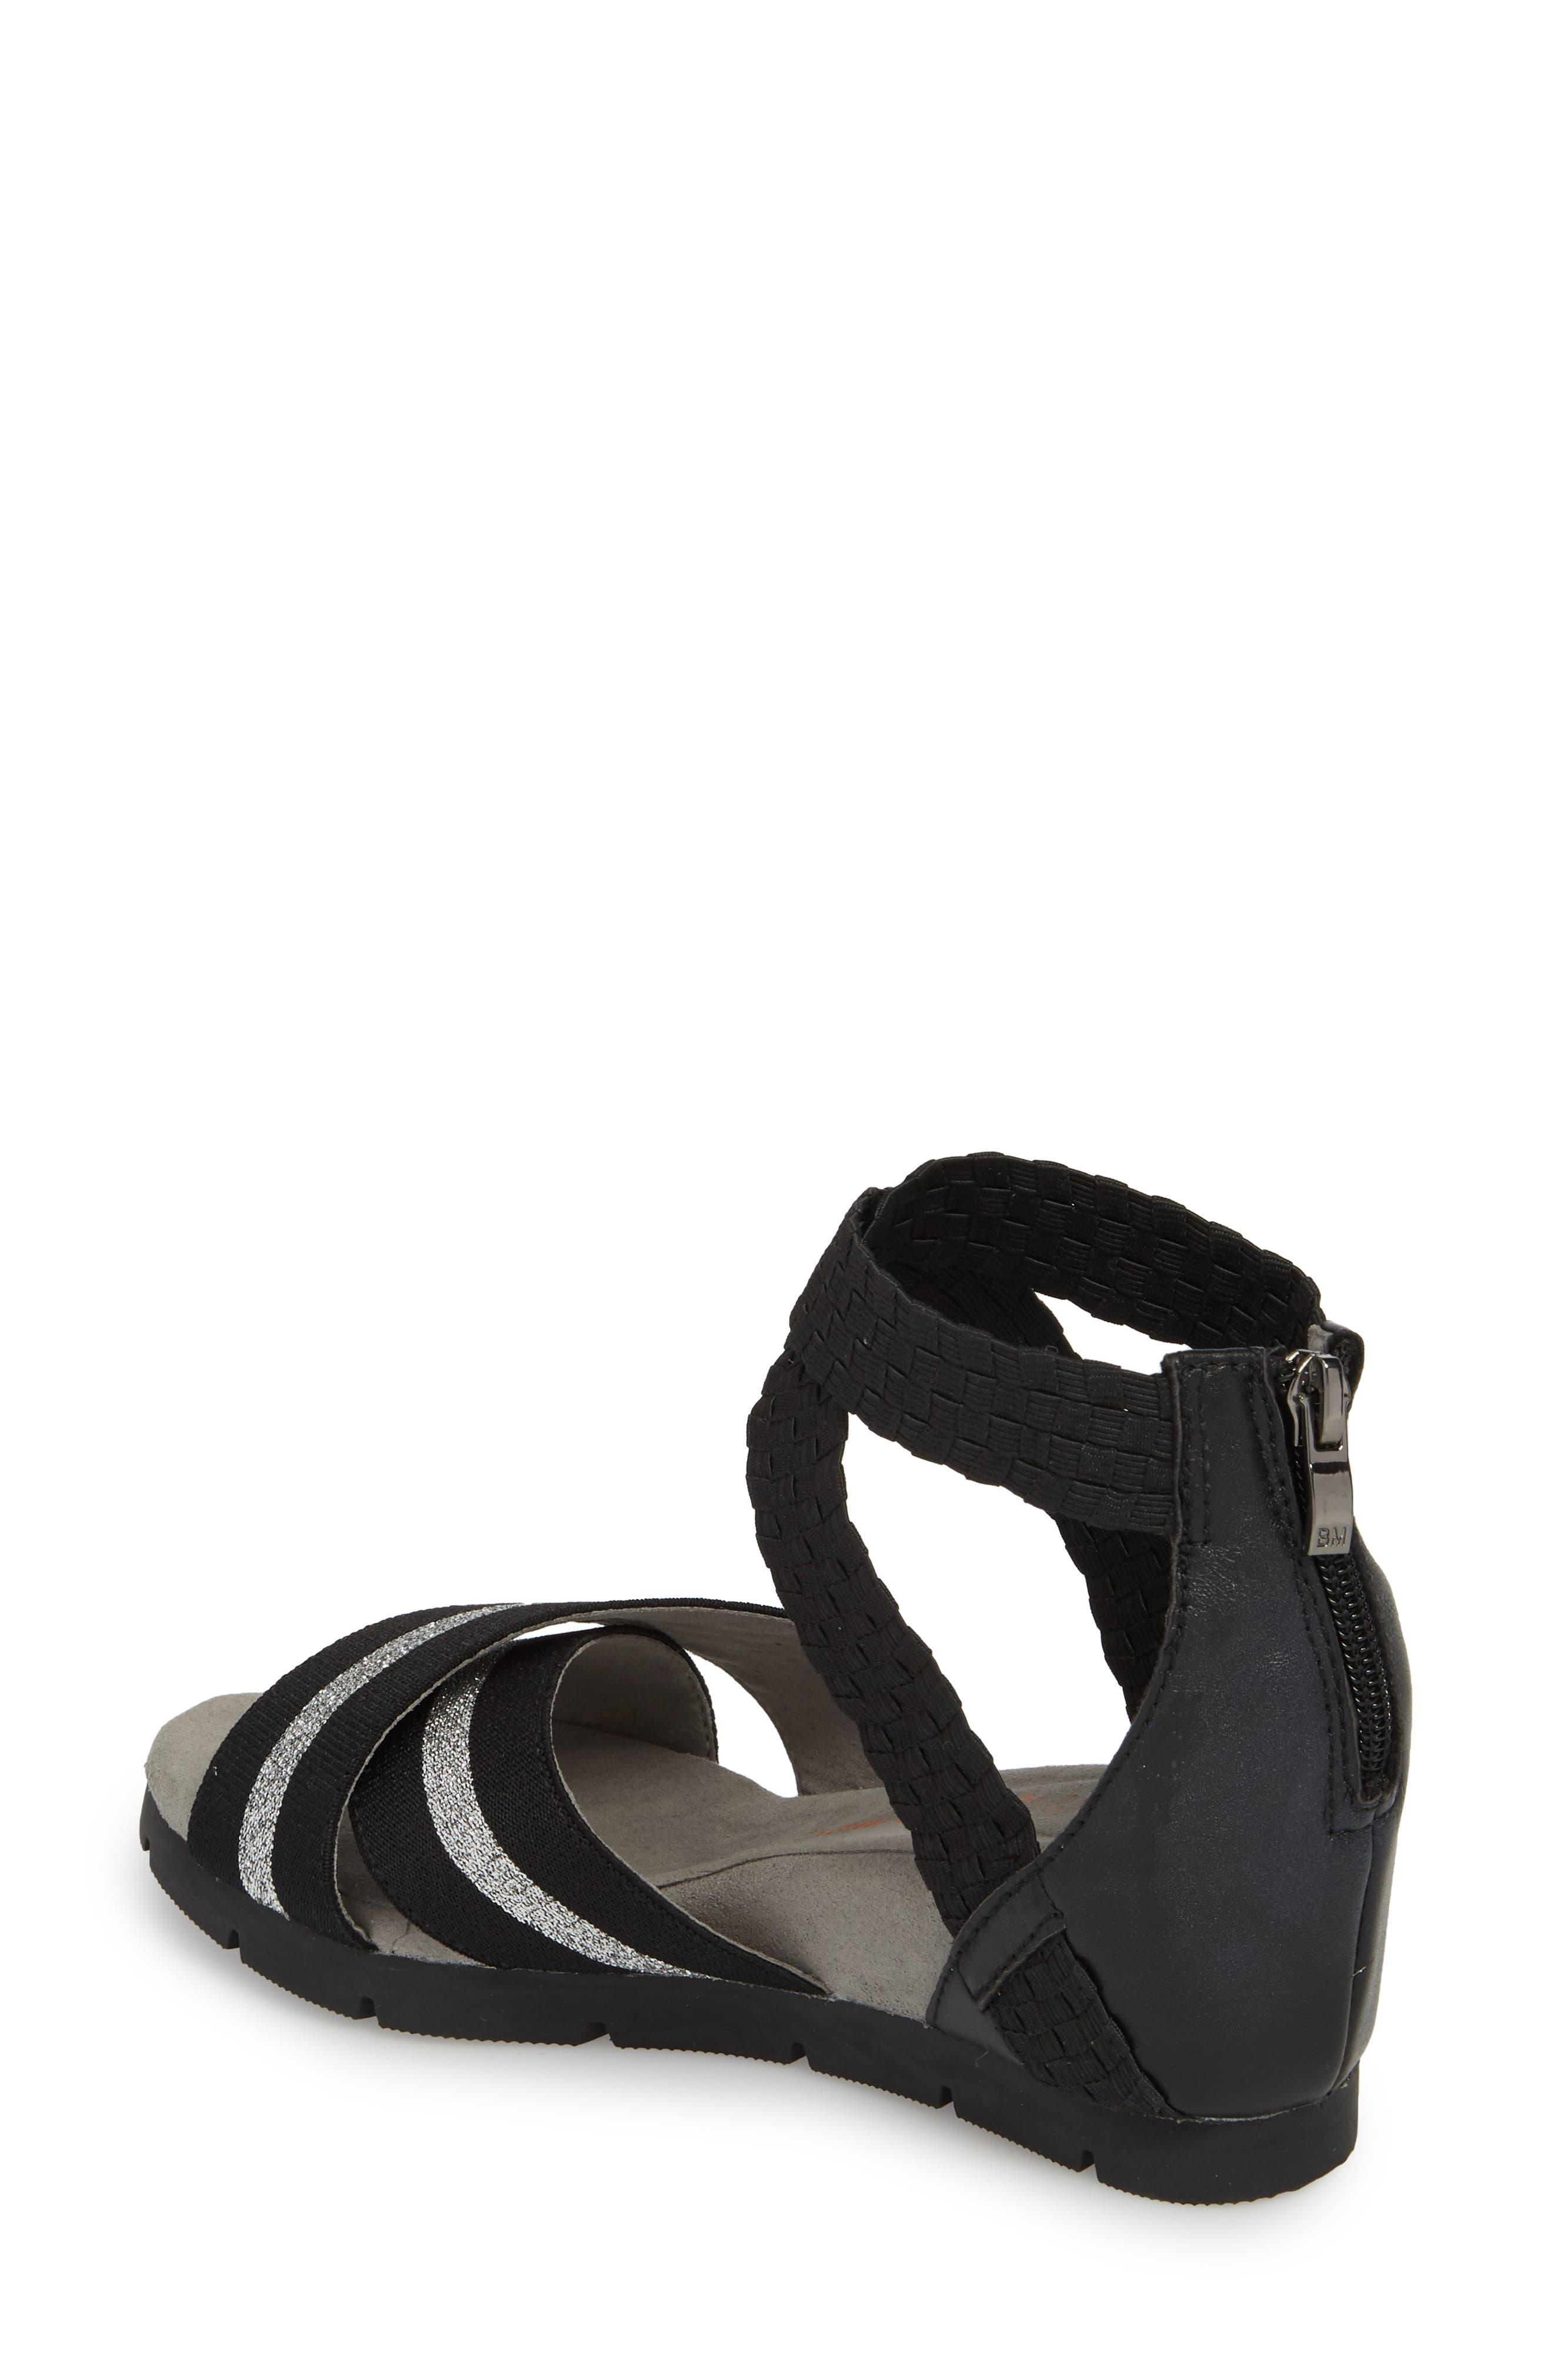 Maldives Wedge Sandal,                             Alternate thumbnail 2, color,                             BLACK FABRIC